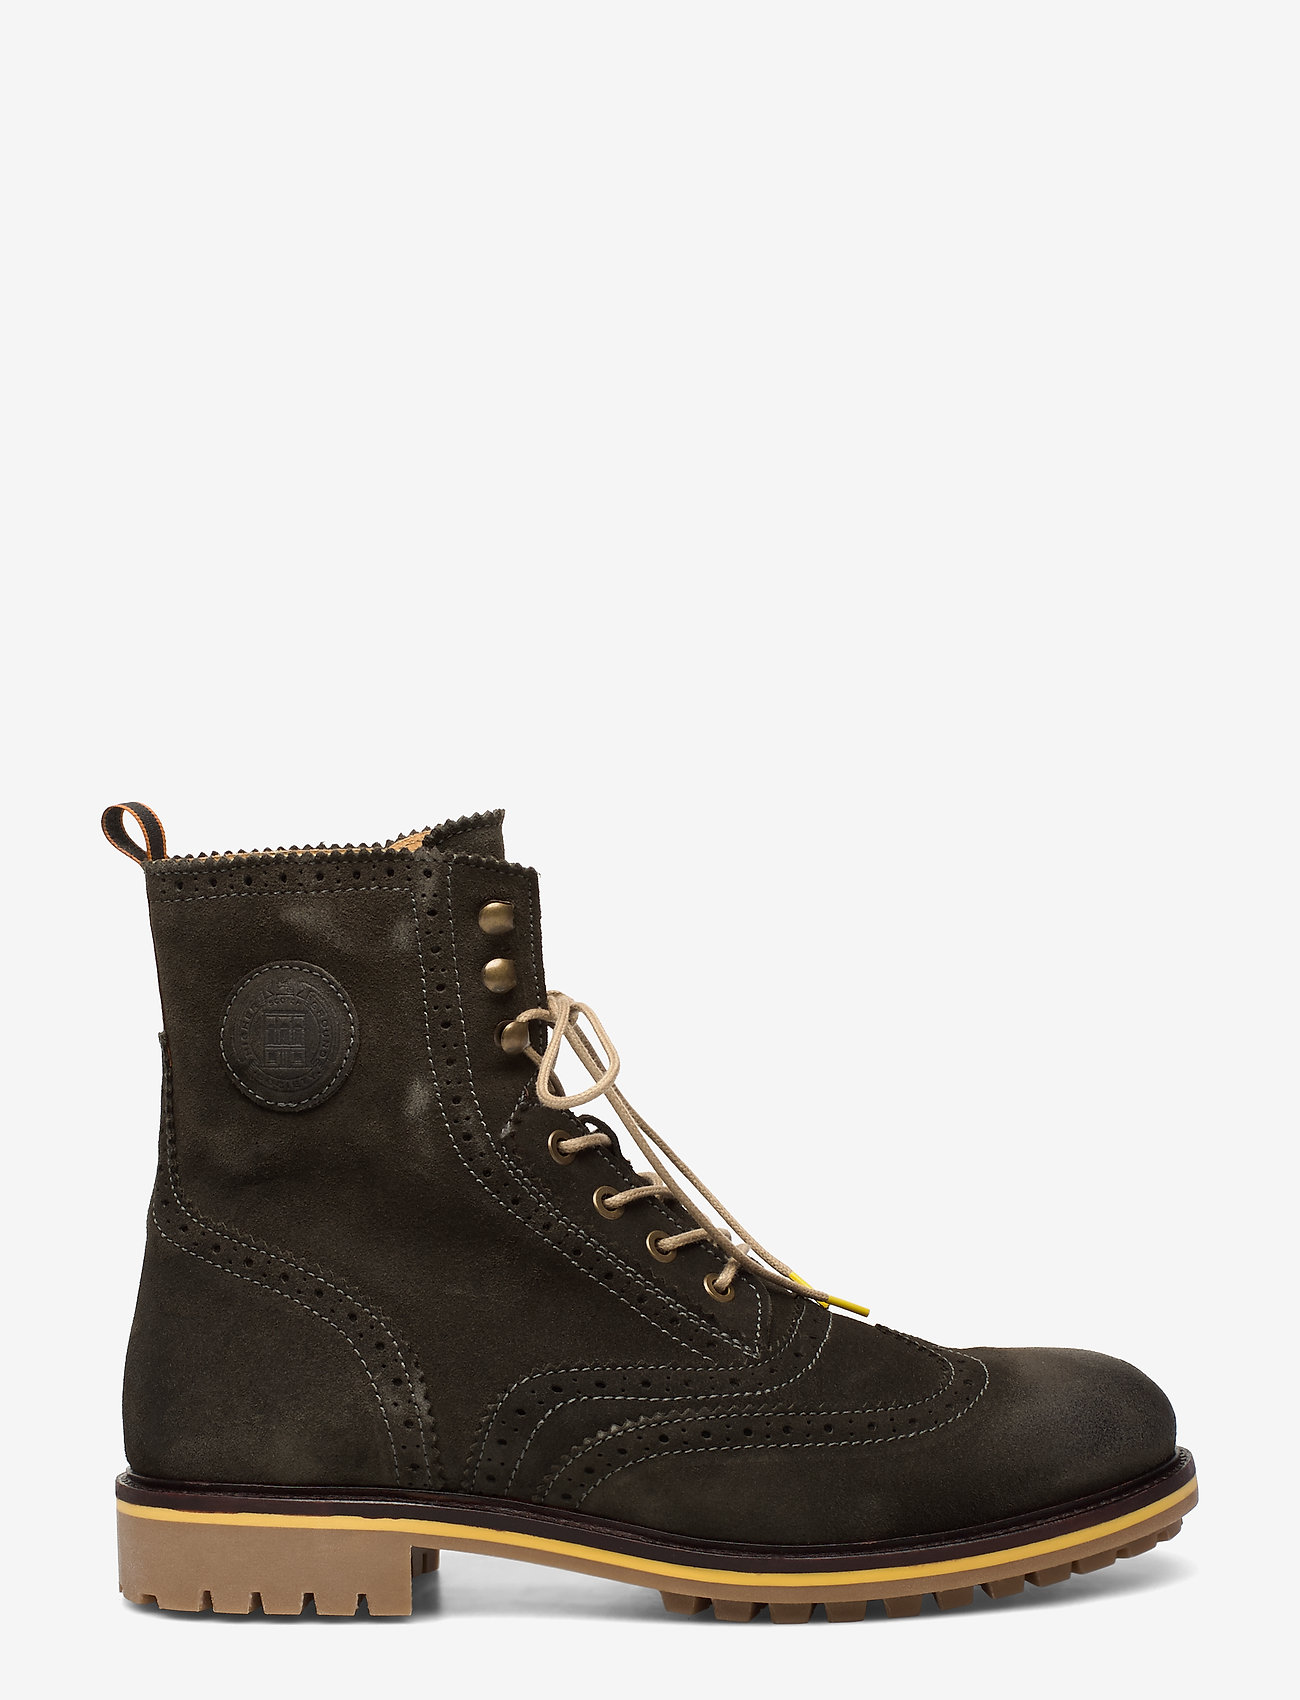 Scotch & Soda Shoes - Borrel Mid laceboot - bottes lacées - forest green - 1